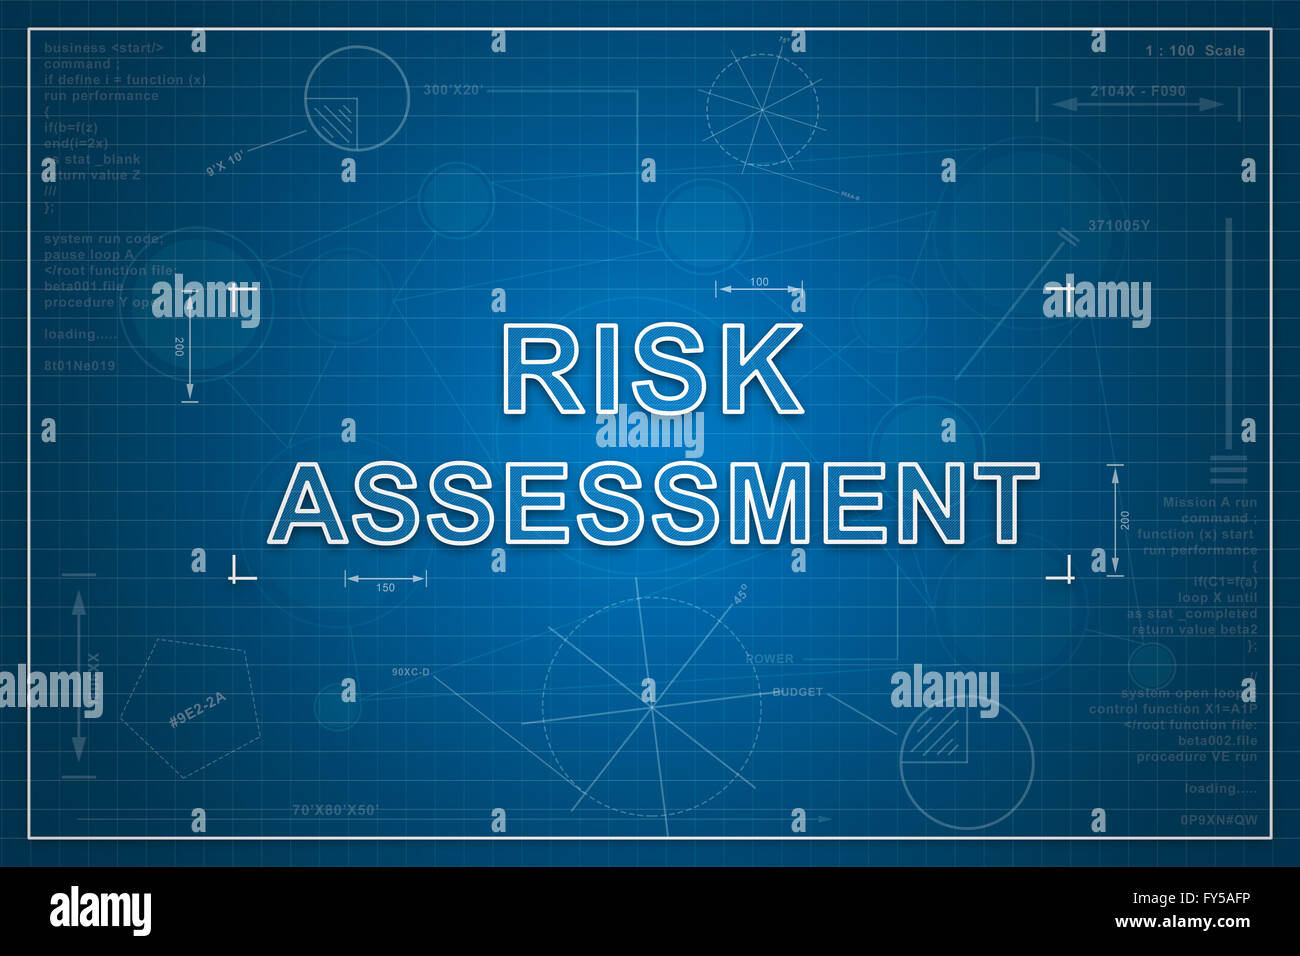 Risk assessment on paper blueprint background business concept risk assessment on paper blueprint background business concept malvernweather Choice Image